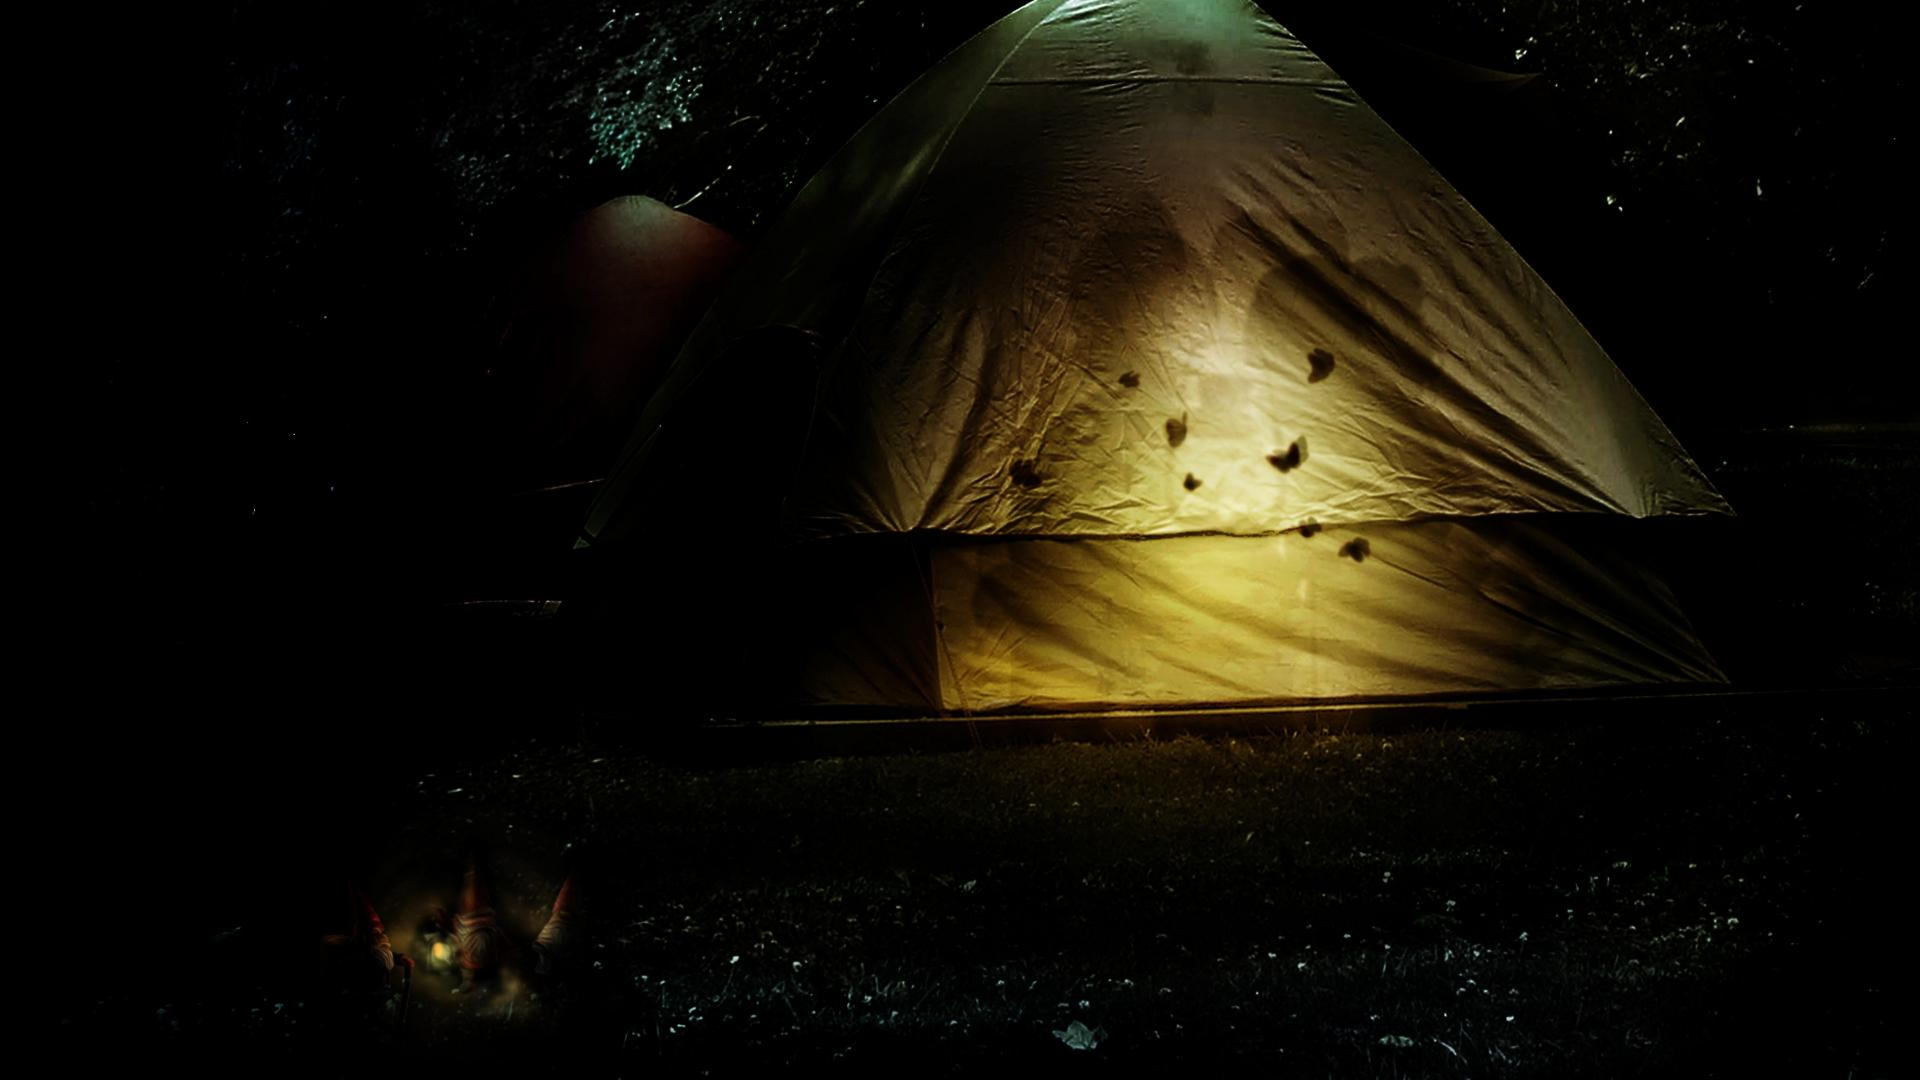 Tents camping moths gnomes children tent lantern wallpaper 37851 1920x1080